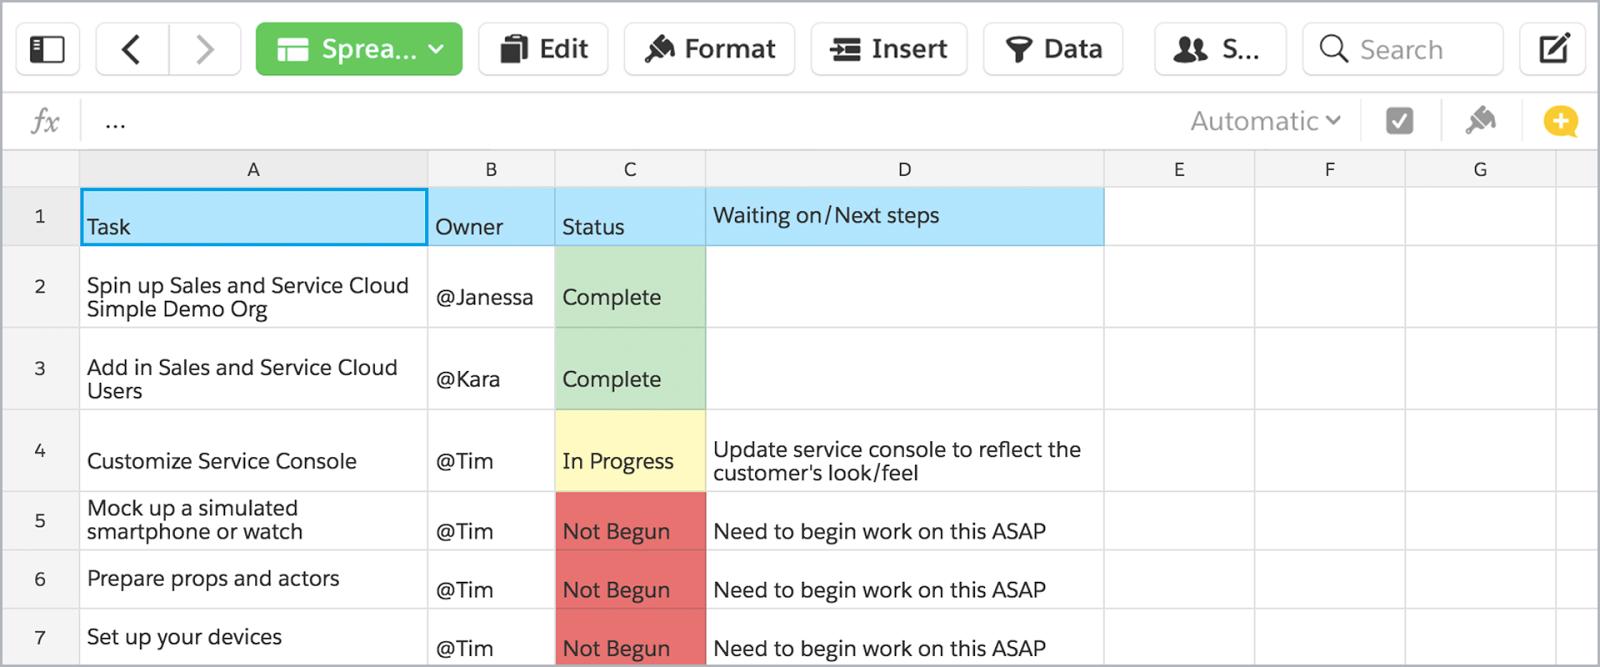 Quip で作成されたバーンダウンリストのサンプル。「Task (ToDo)」、「Owner (所有者)」、「Status (状況)」、「Waiting on/Next steps (待機中/次のステップ)」という列があります。